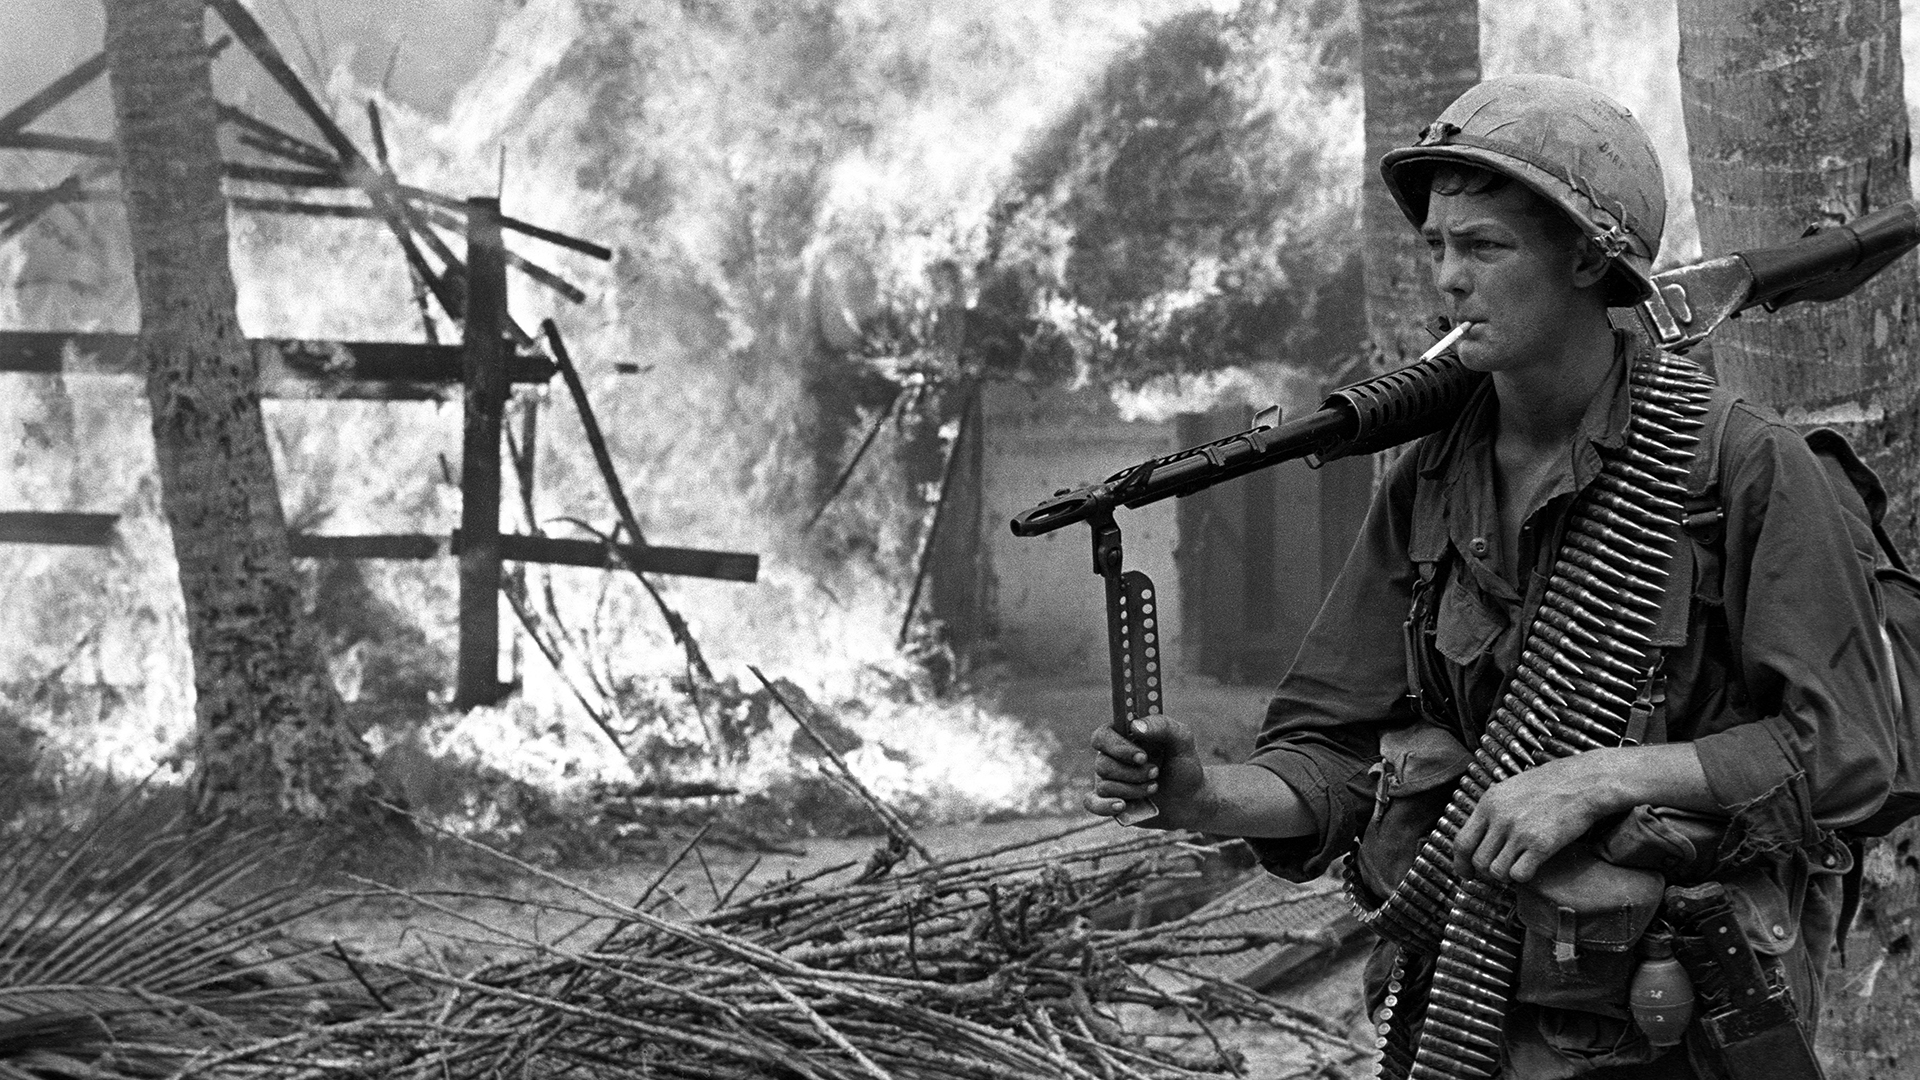 vietnam war - photo #11